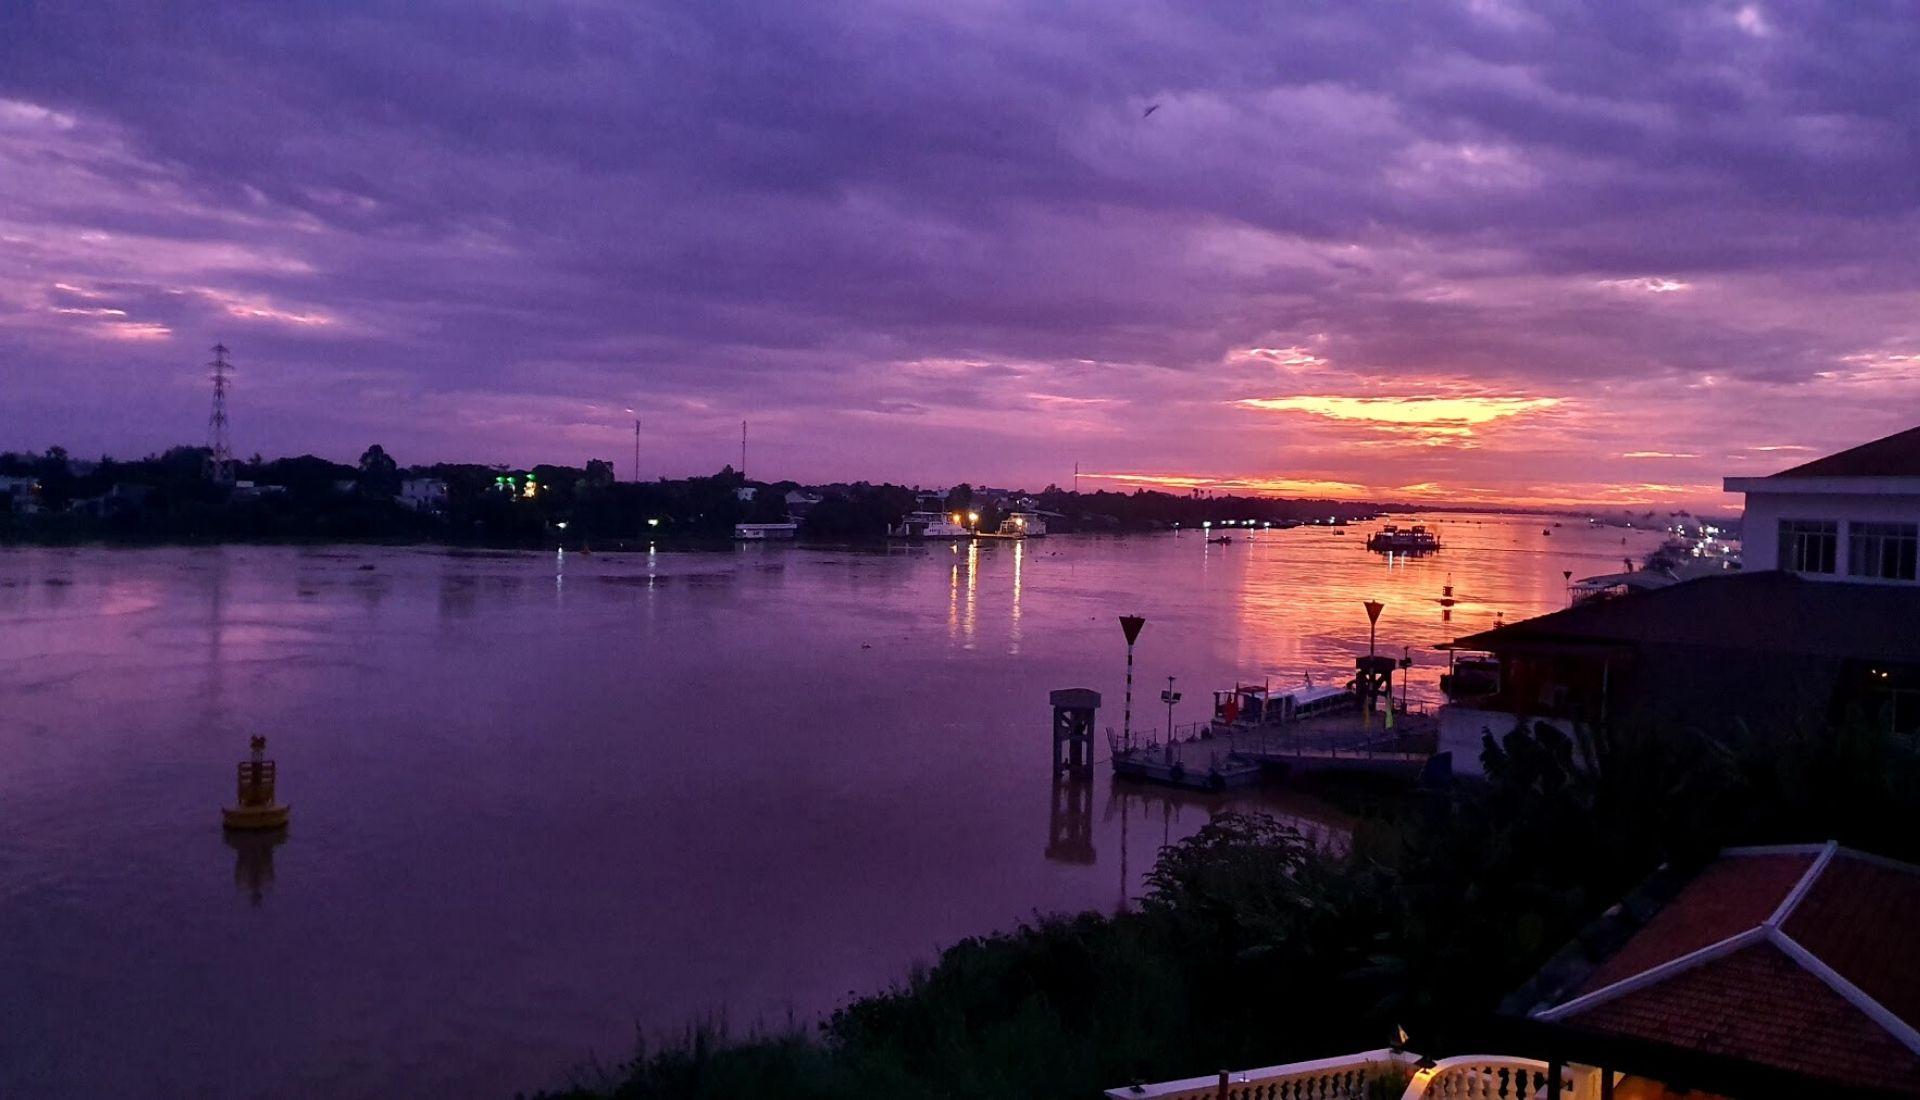 Sunrise at Chau Doc